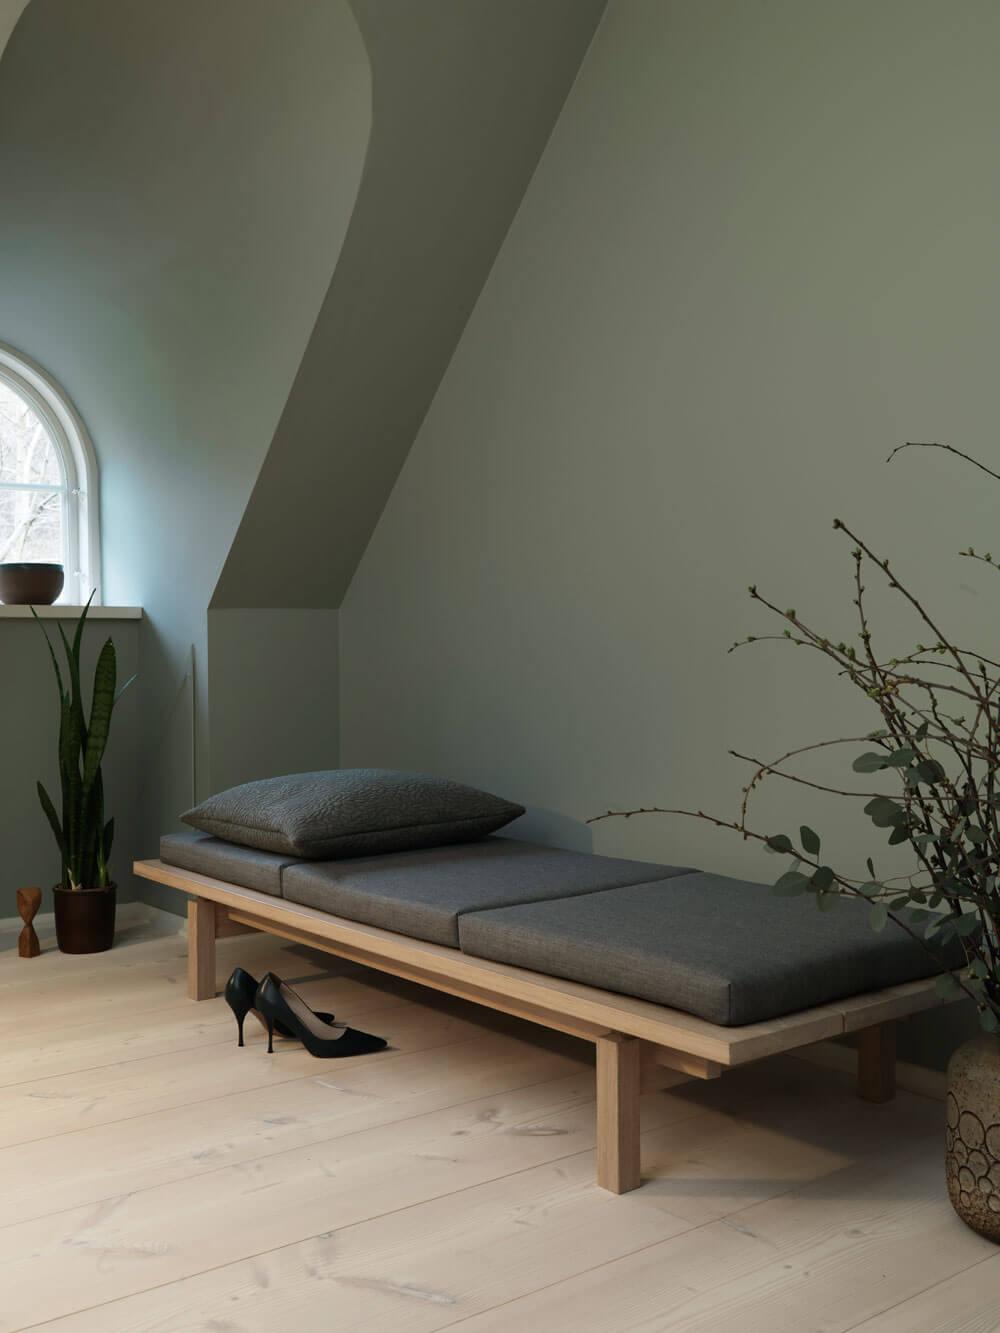 kvadrat-dinesen-country-home-wohnzimmer-foto-jorgen-overbys-tegnestue-gruene-suite-decohome.de_